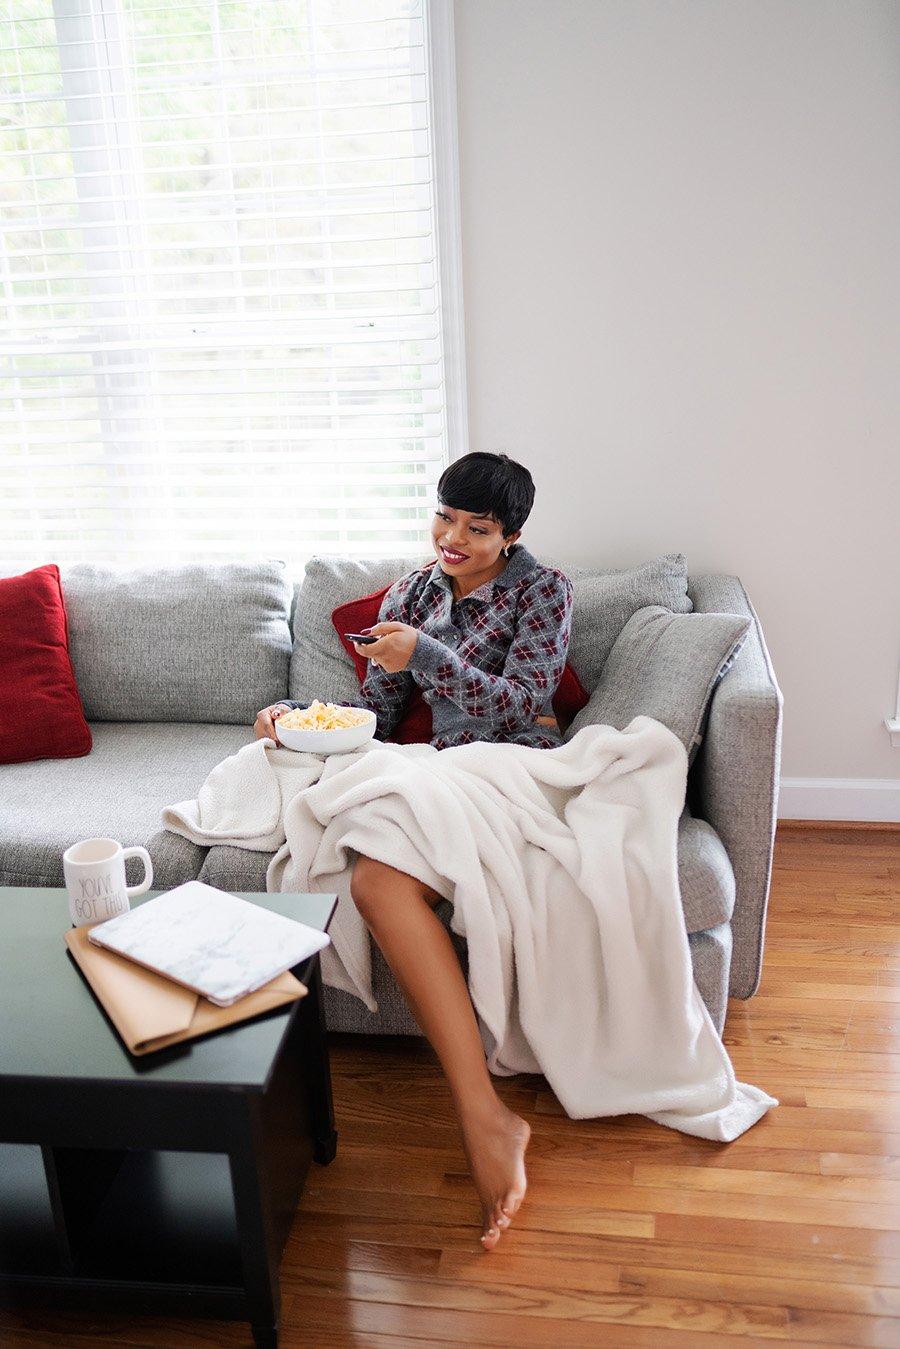 stella-adewunmi-of-jadore-fashion-blog-shares-cozy-loungewear-holiday-gift-ideas-for-homebody